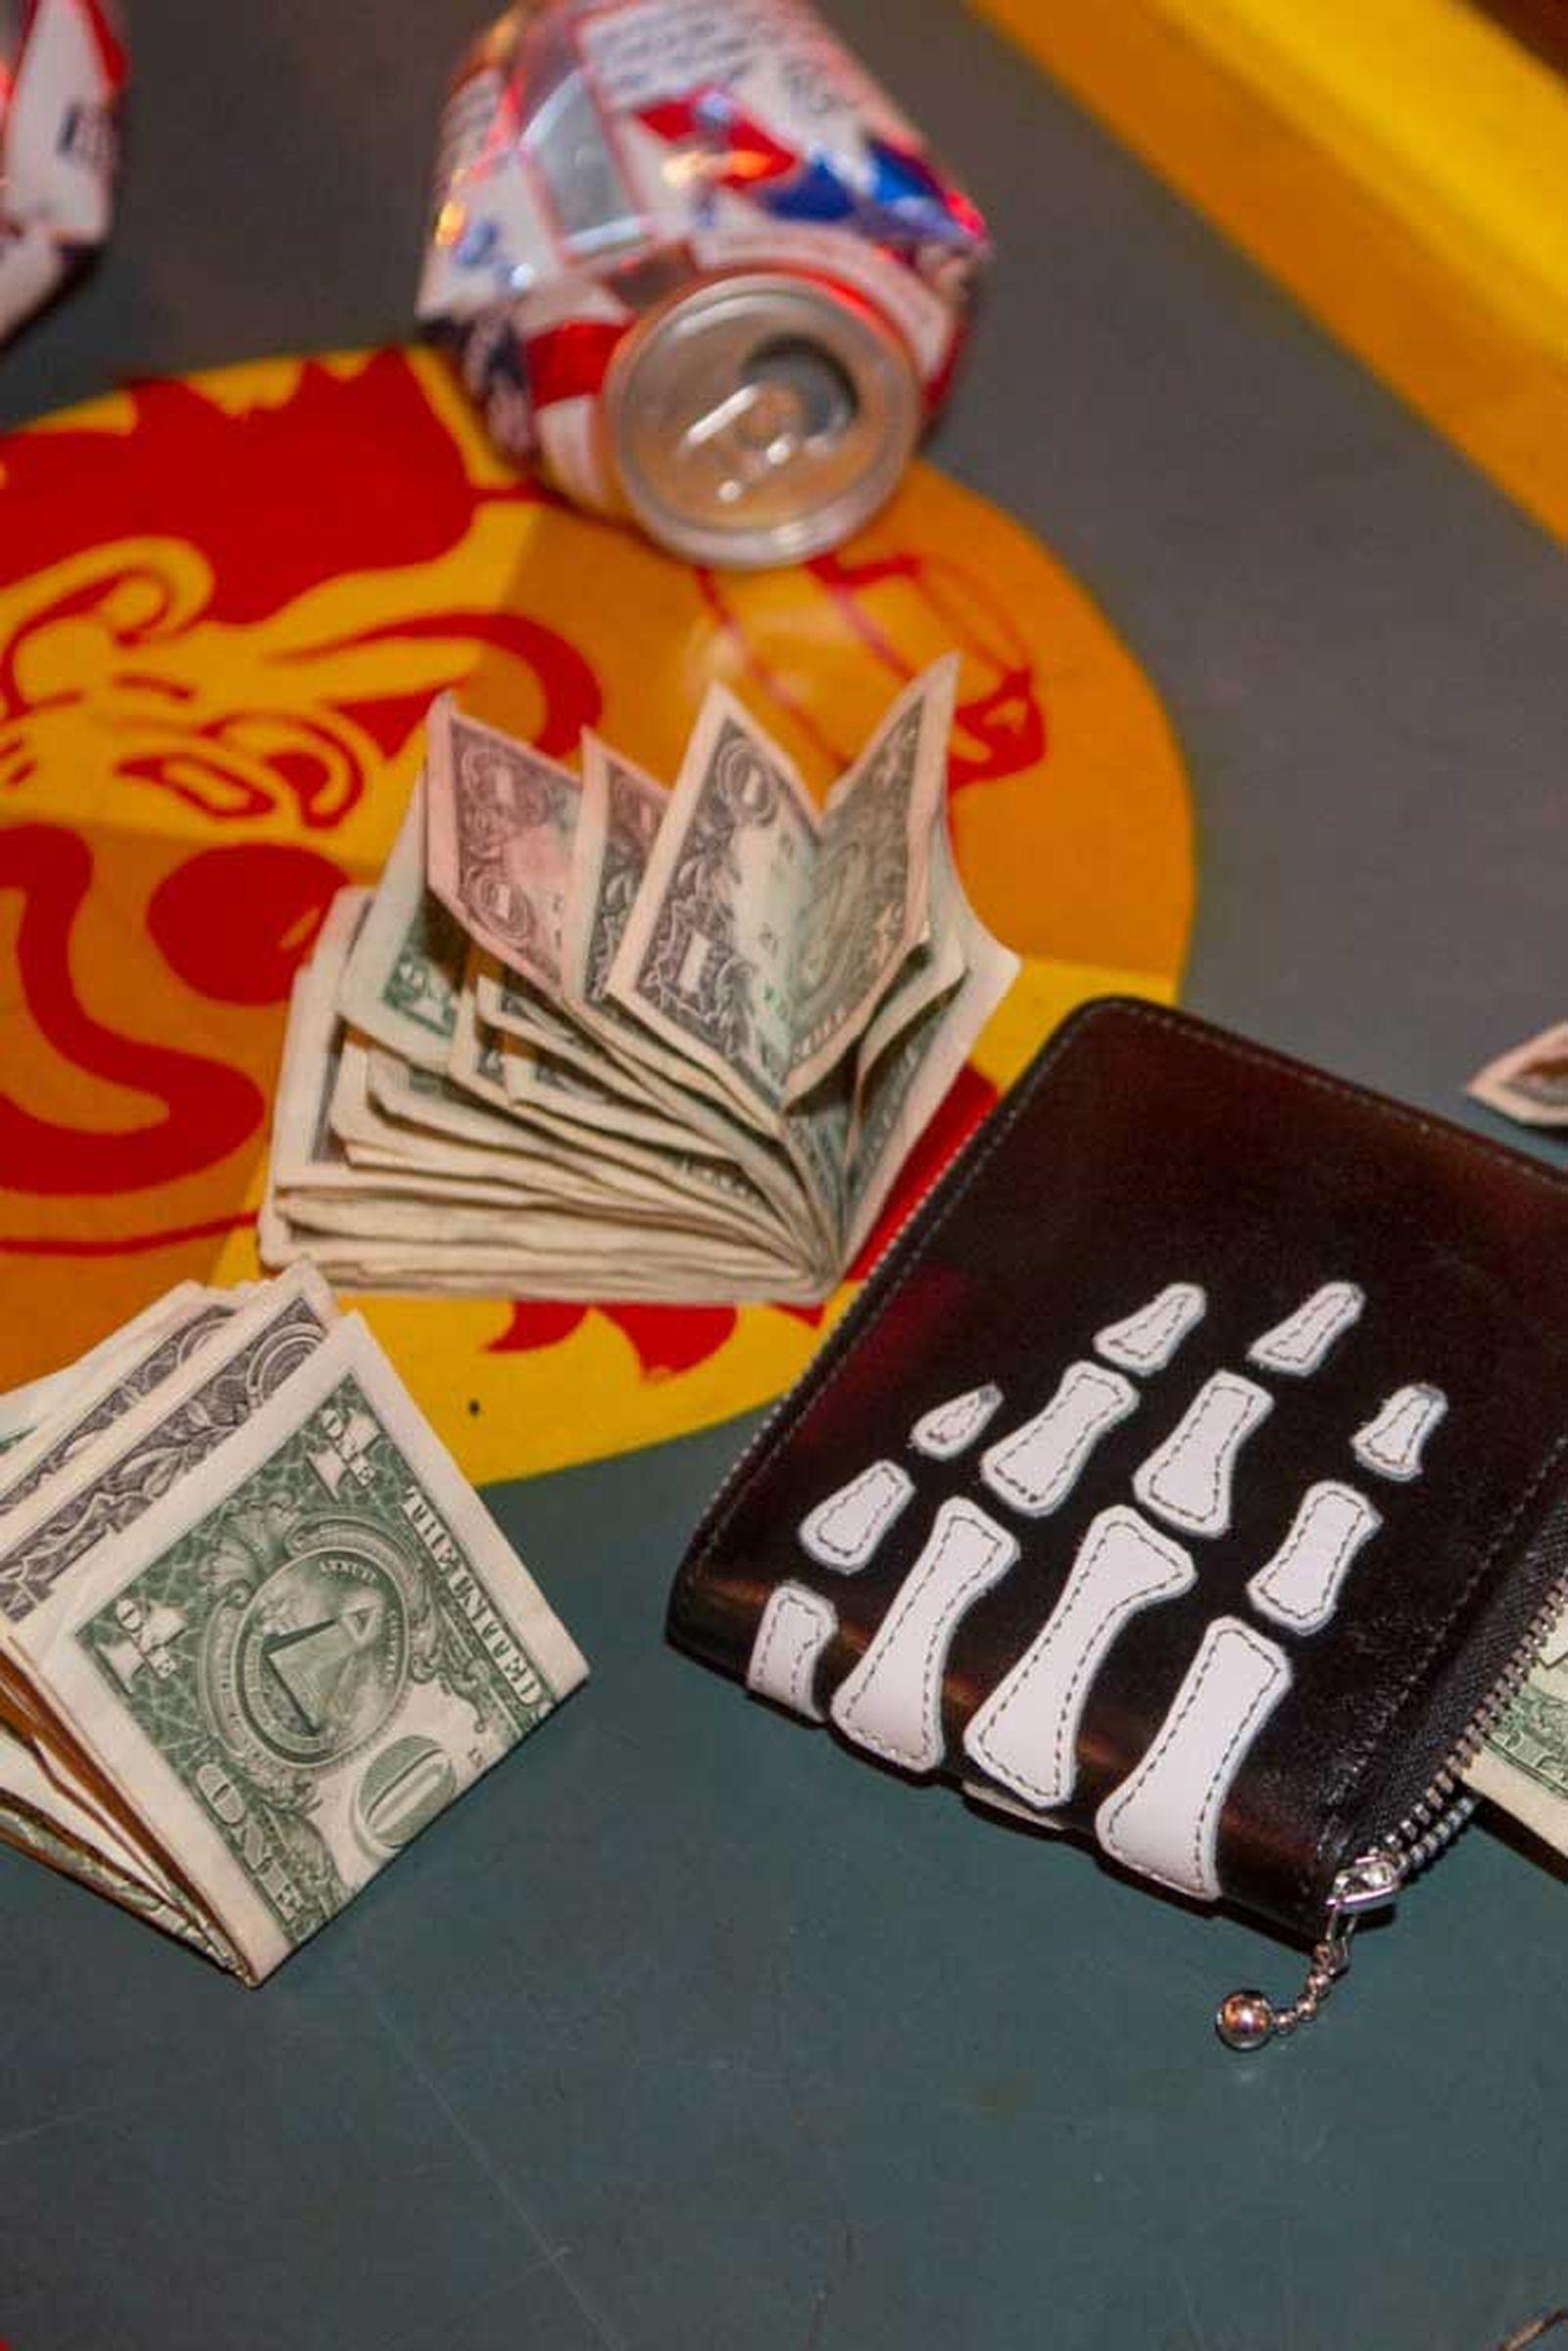 kapital kountry free tibet collection controversy (31)